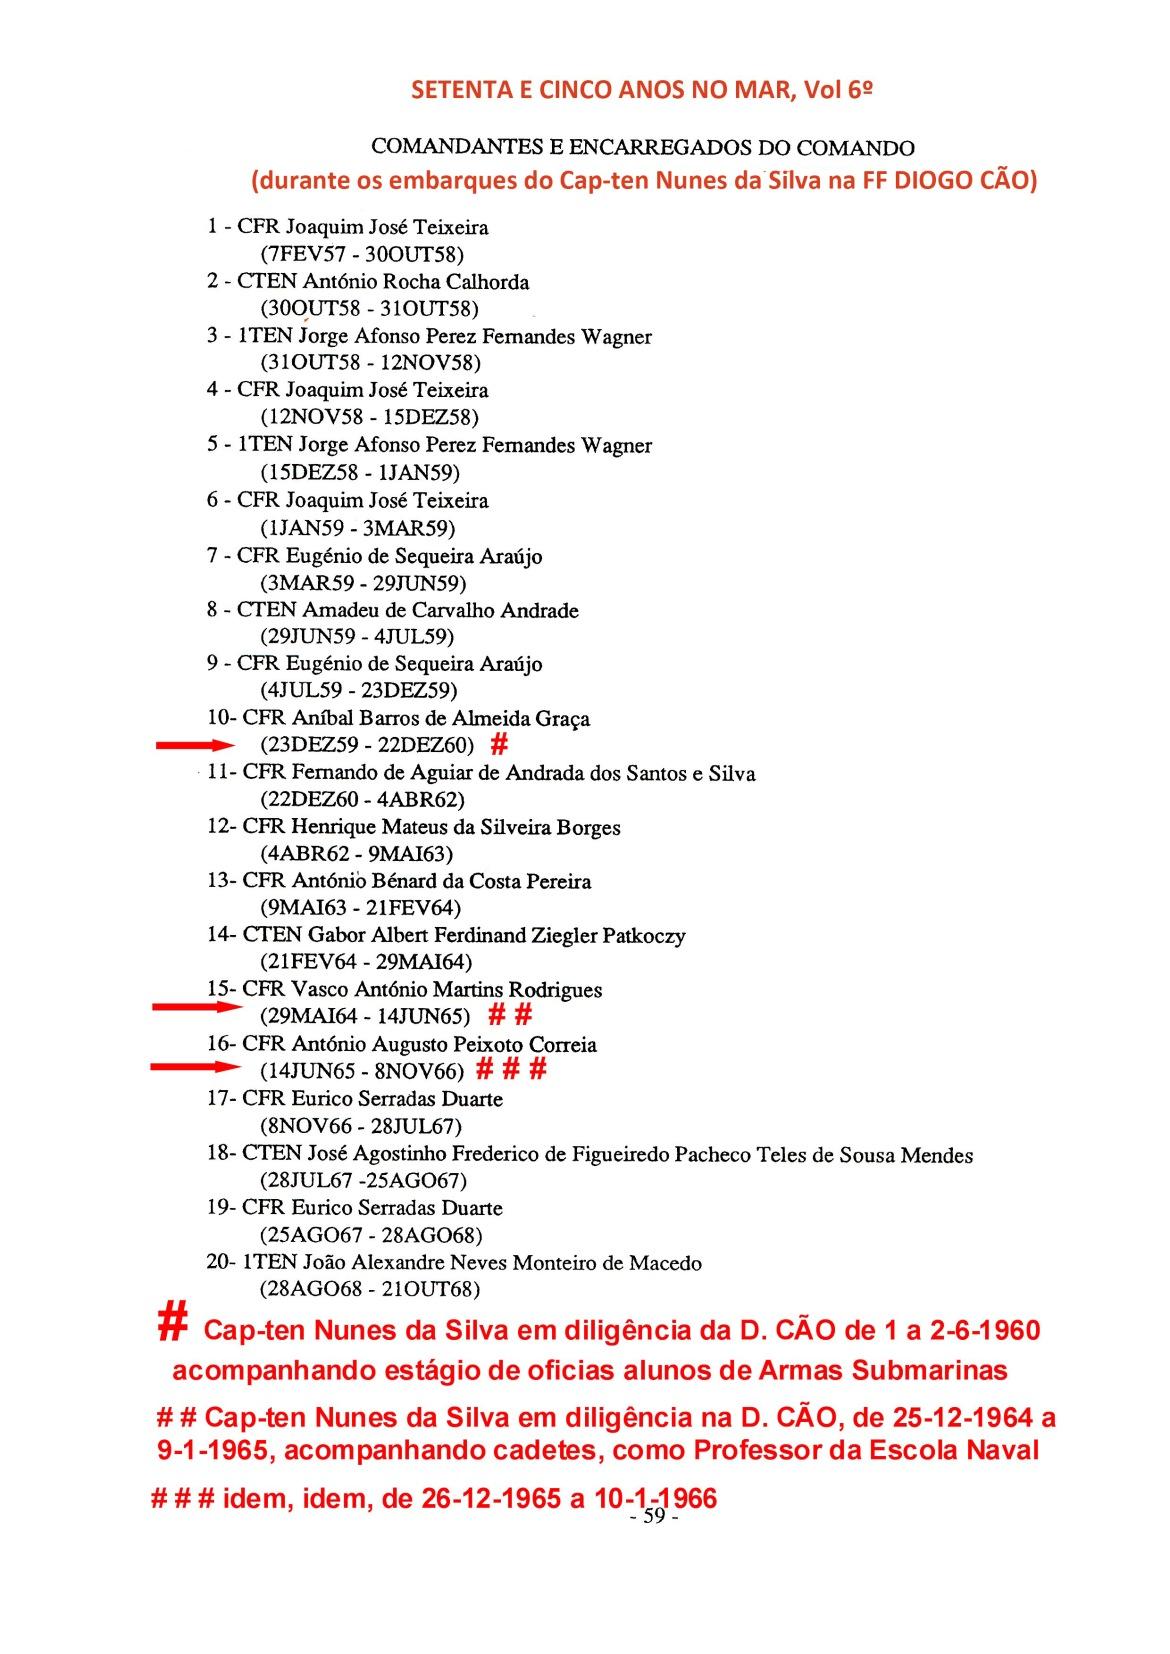 00444 964-12-25 e 65-12-26 Comandantes da FF Diogo Cão durante embarques de Cap-ten Nunes da Silva